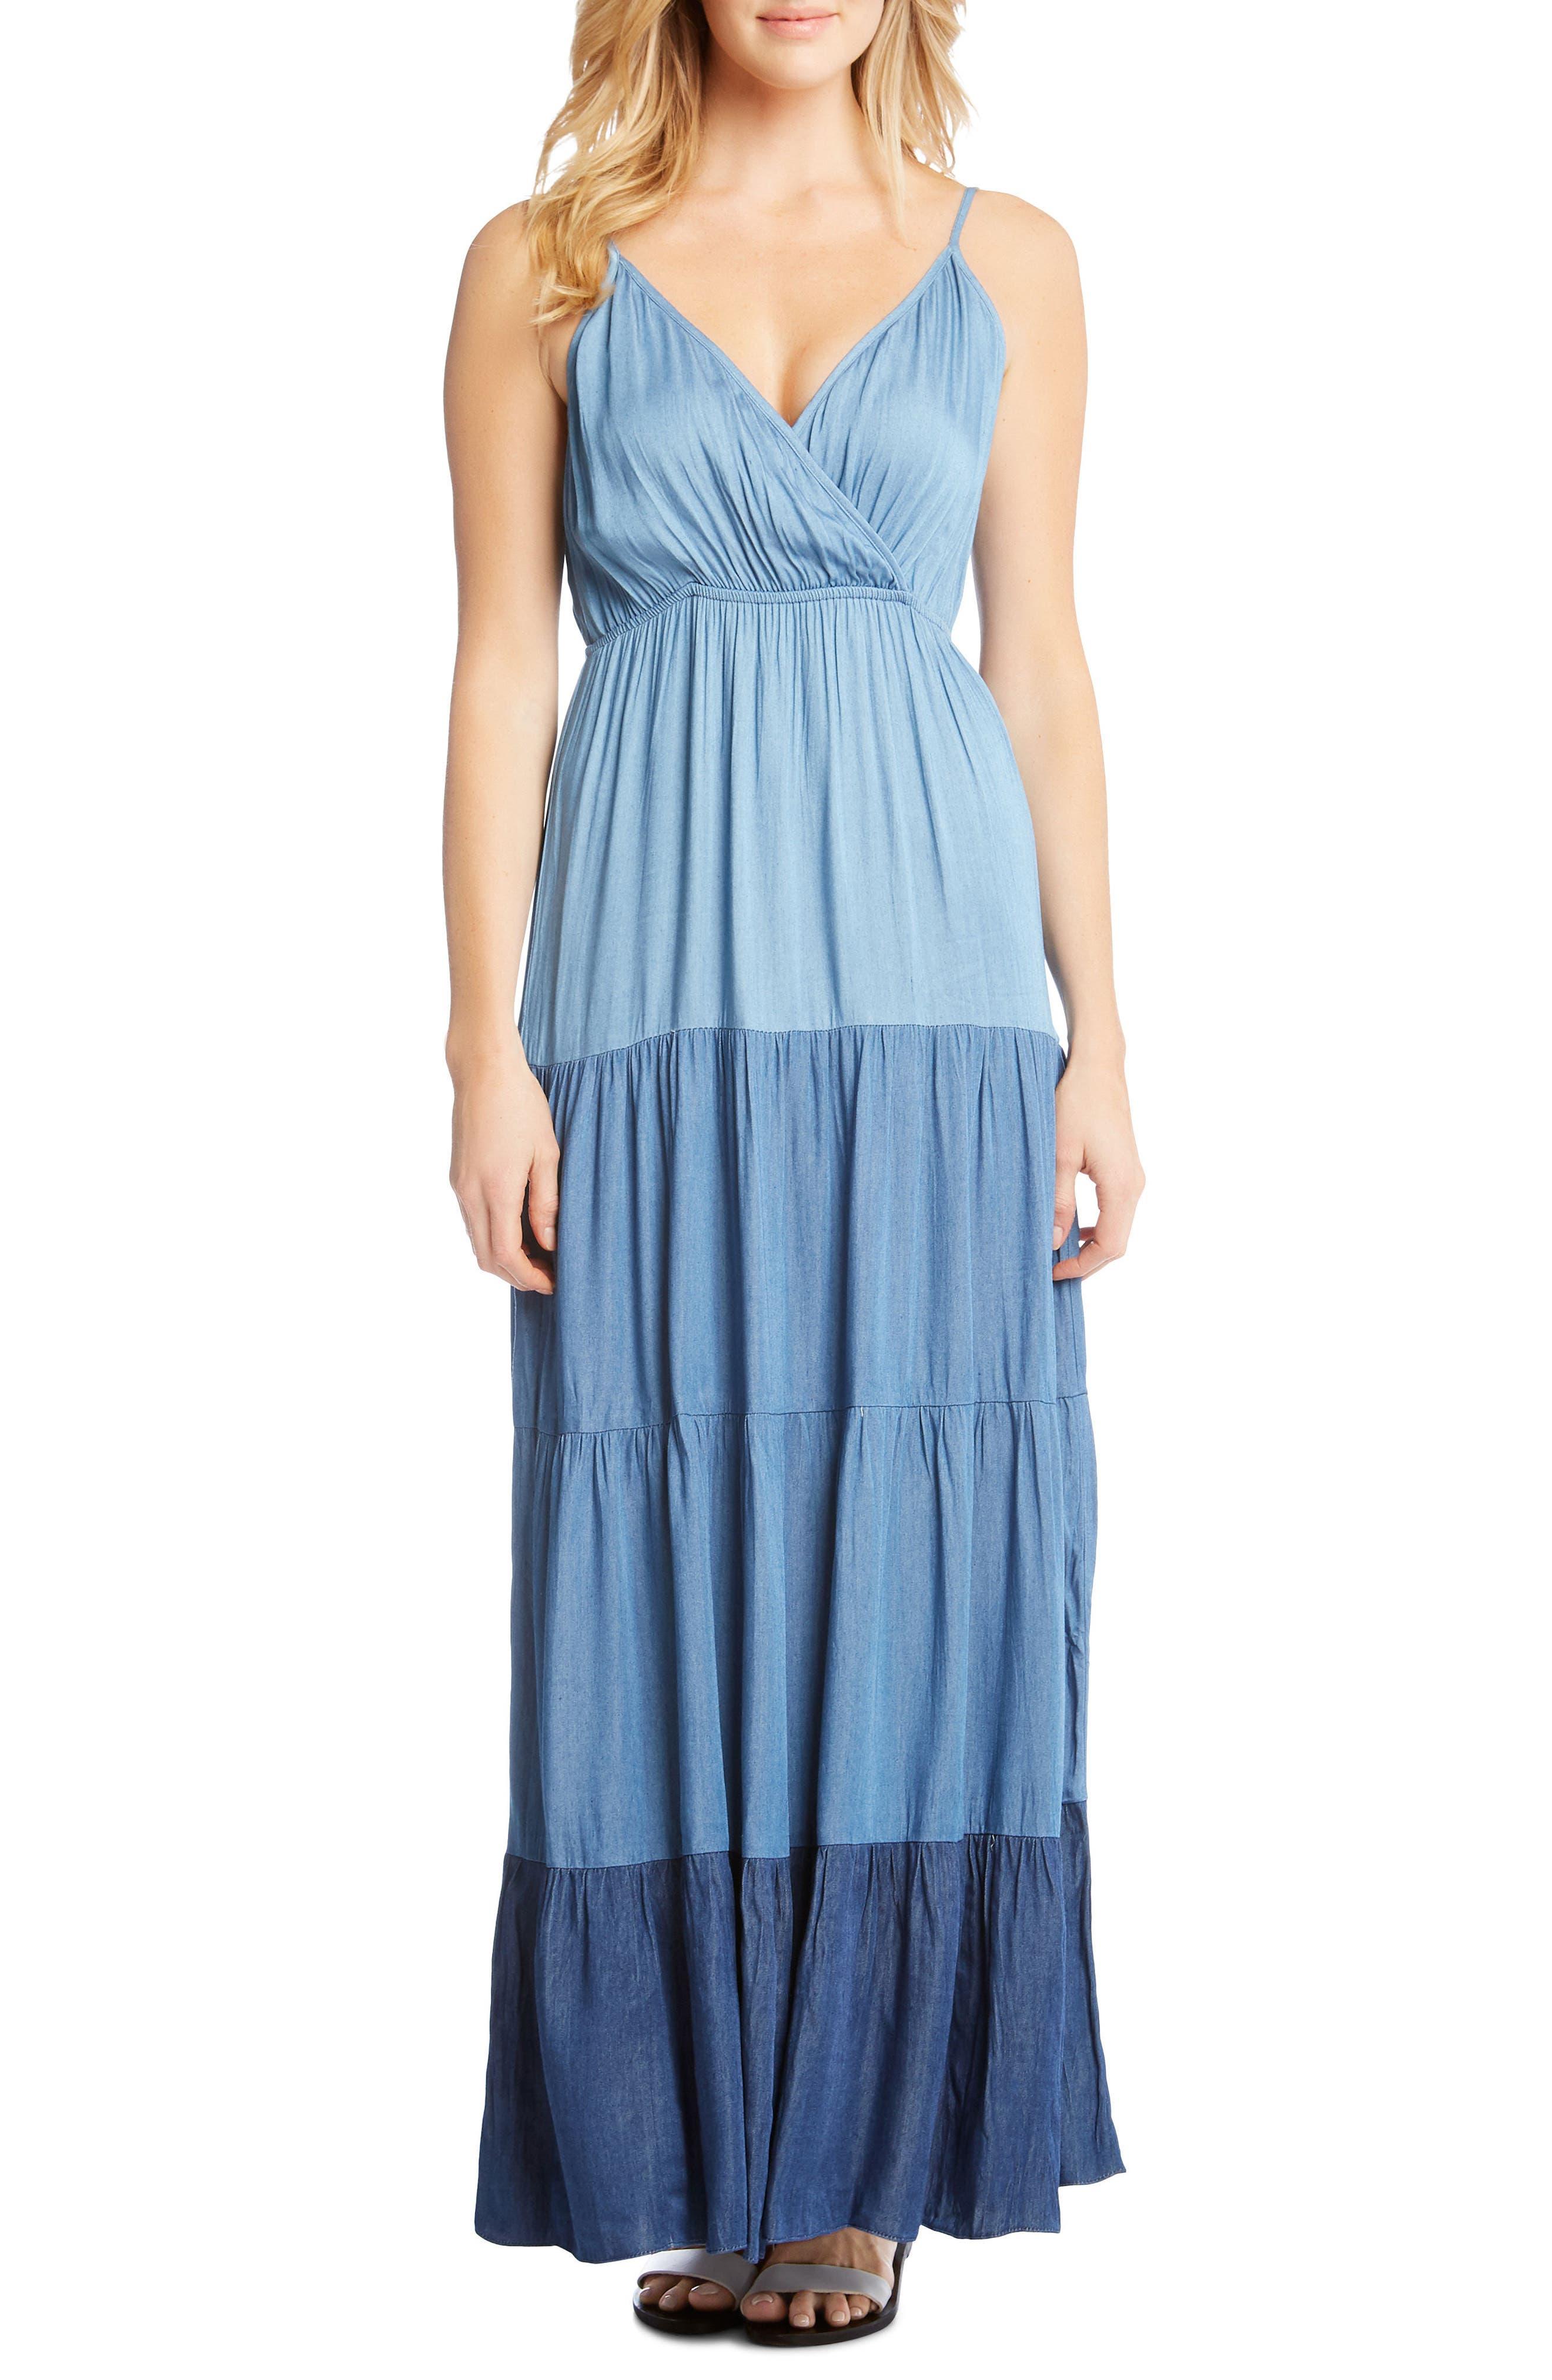 Tiered Chambray Maxi Dress,                         Main,                         color, 488